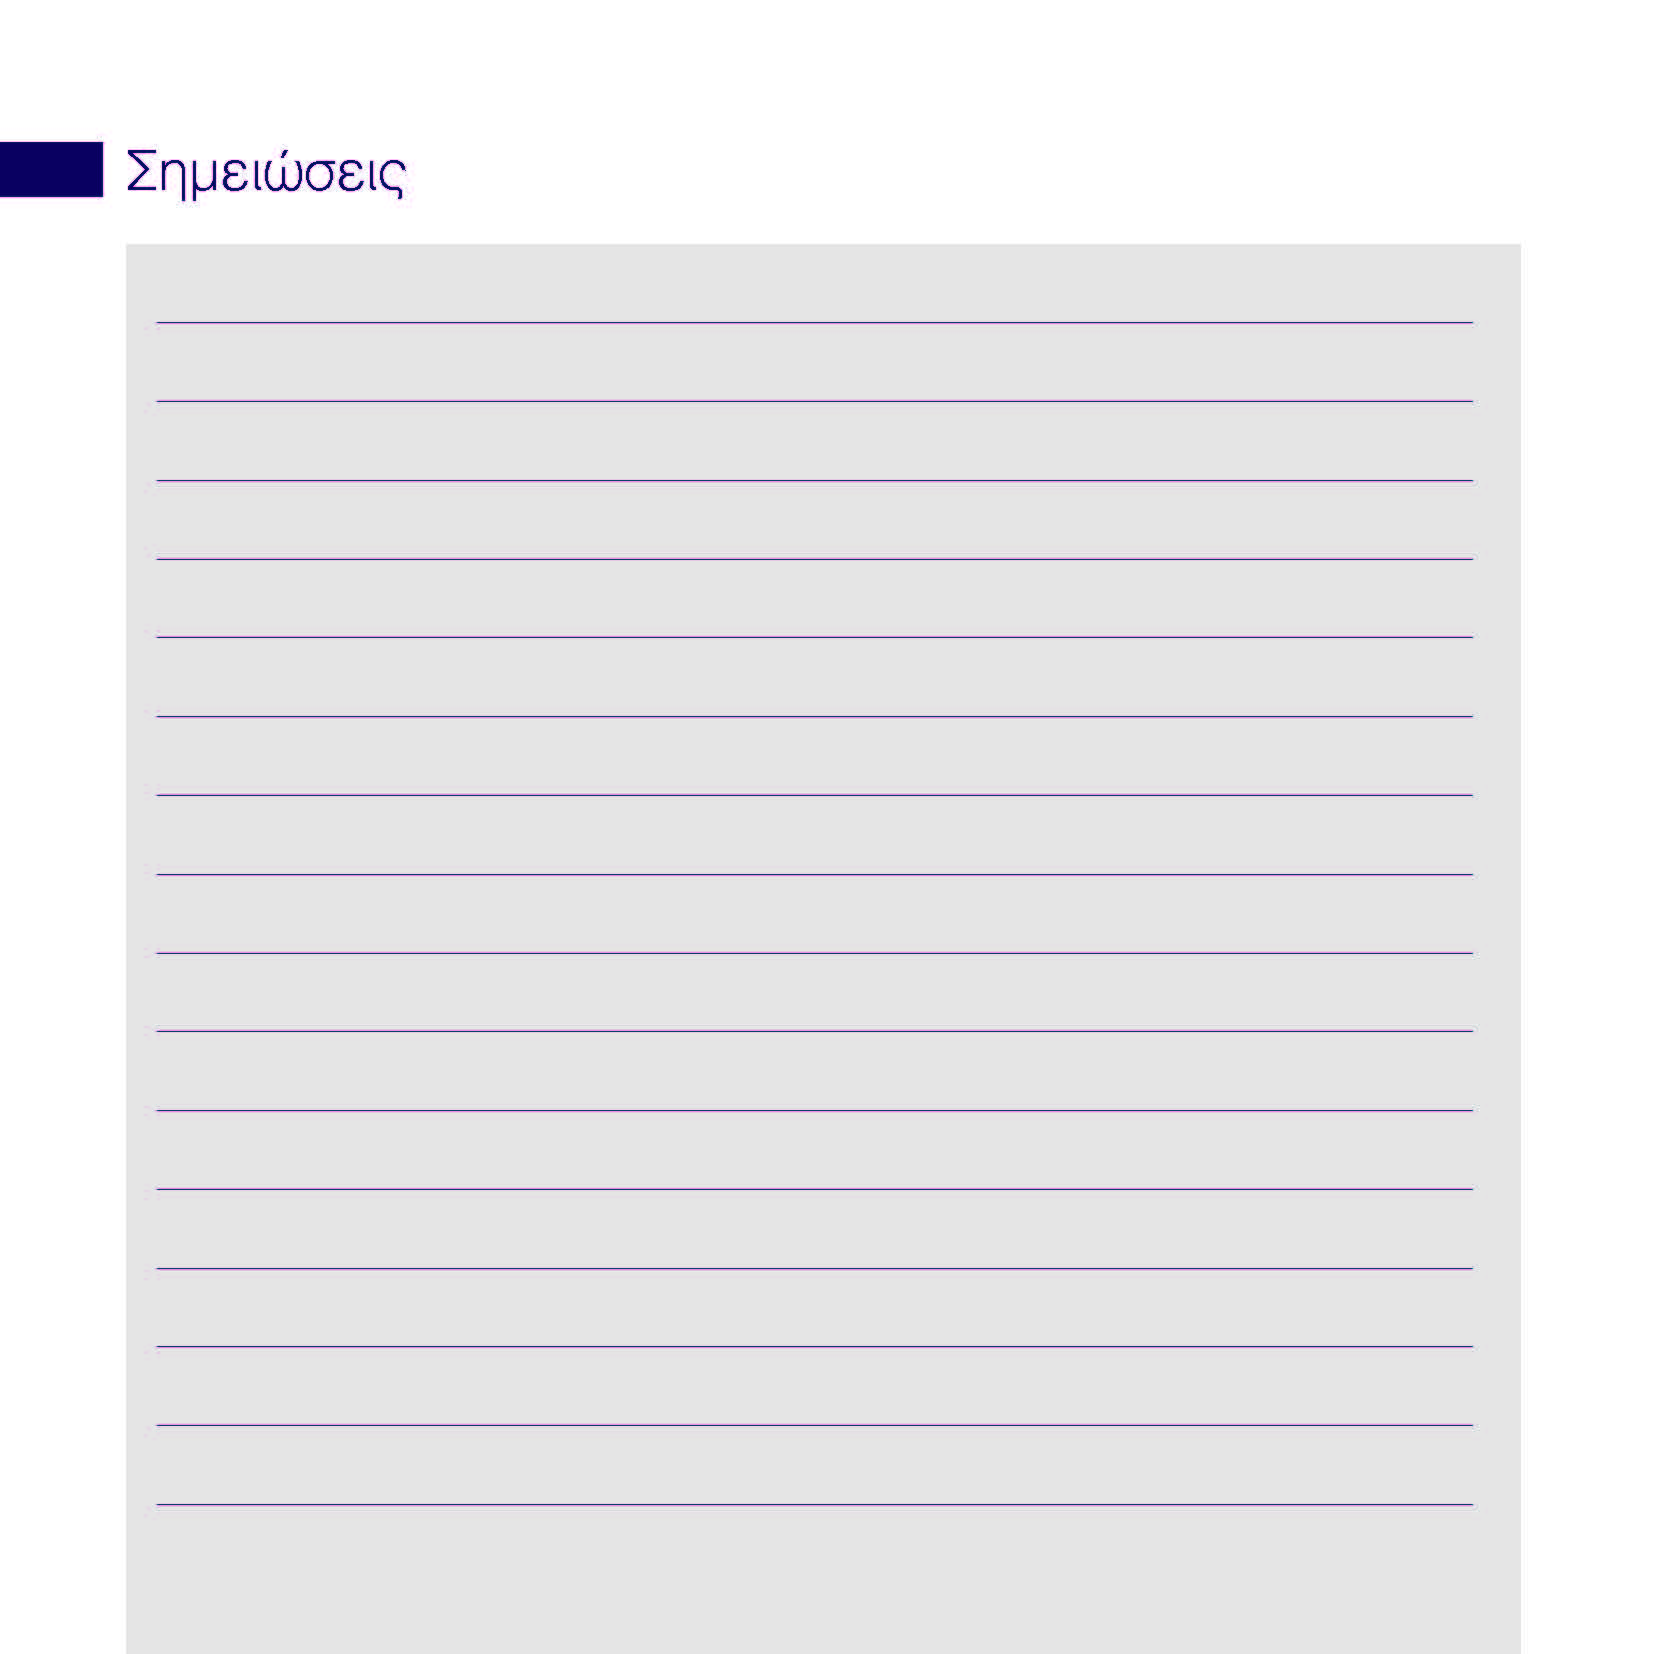 https://www.jib.gr/wp-content/uploads/2020/09/OPTIMA-BANK-BOOKLET-WEB_Page_098.jpg